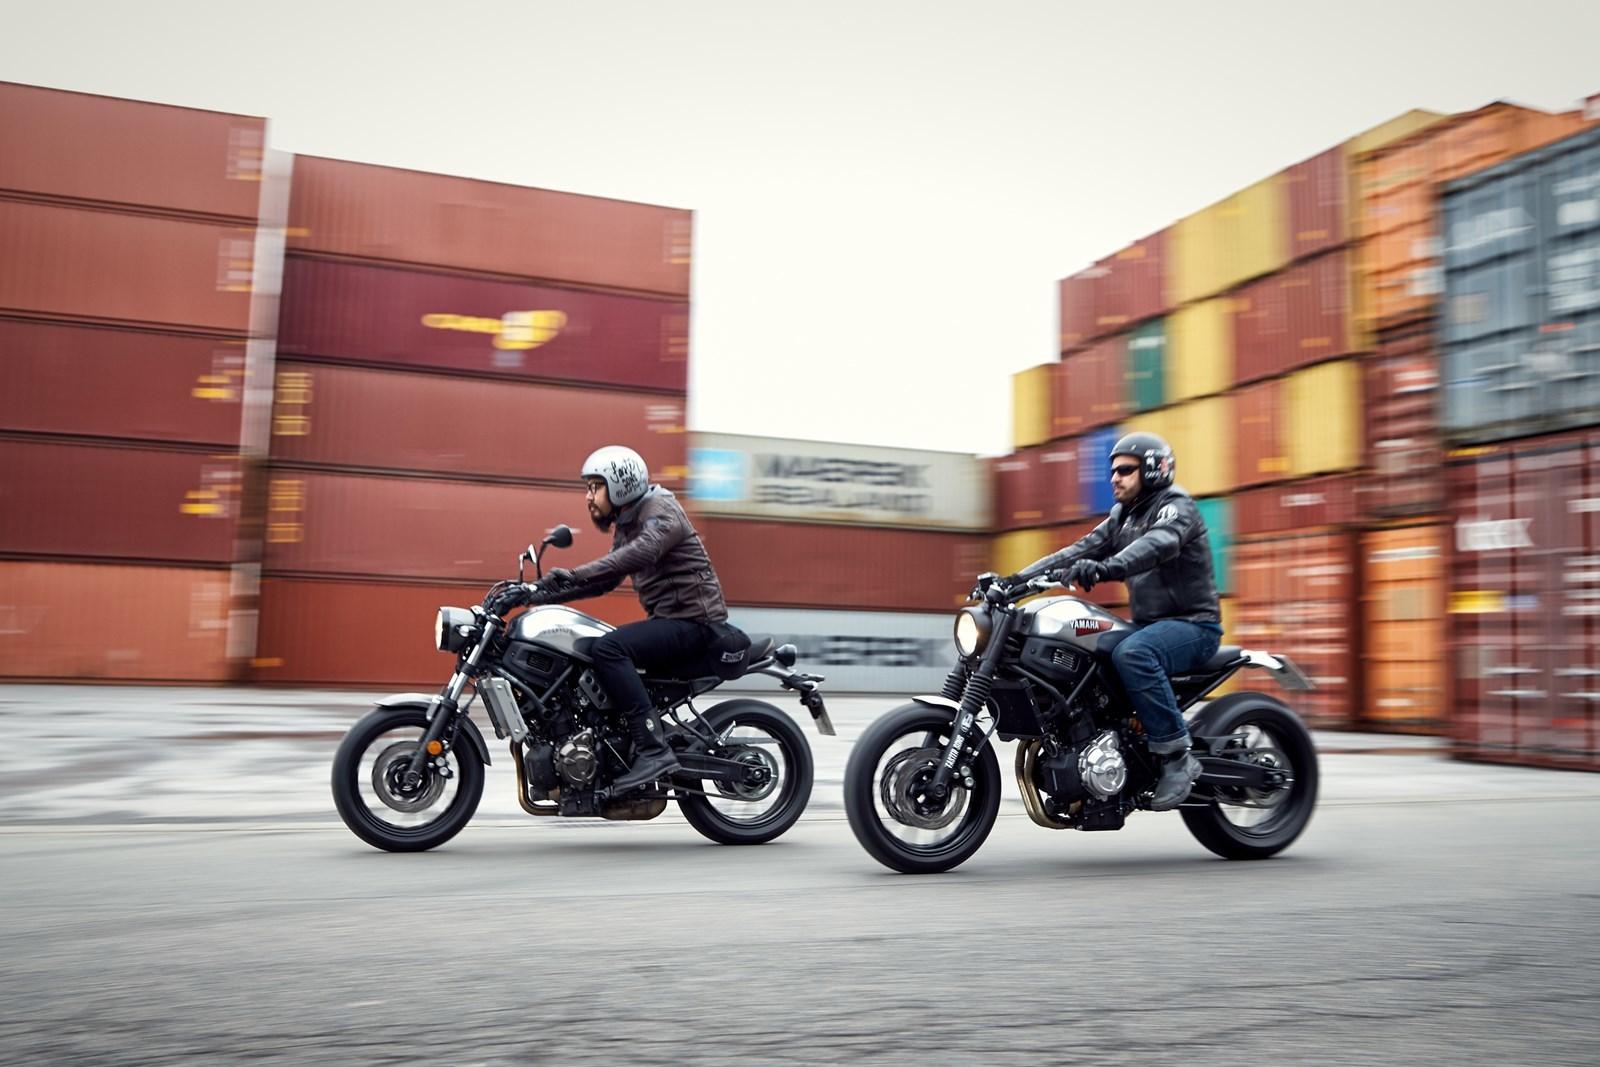 Yamaha XSR700 Super 7 by JvB-Moto